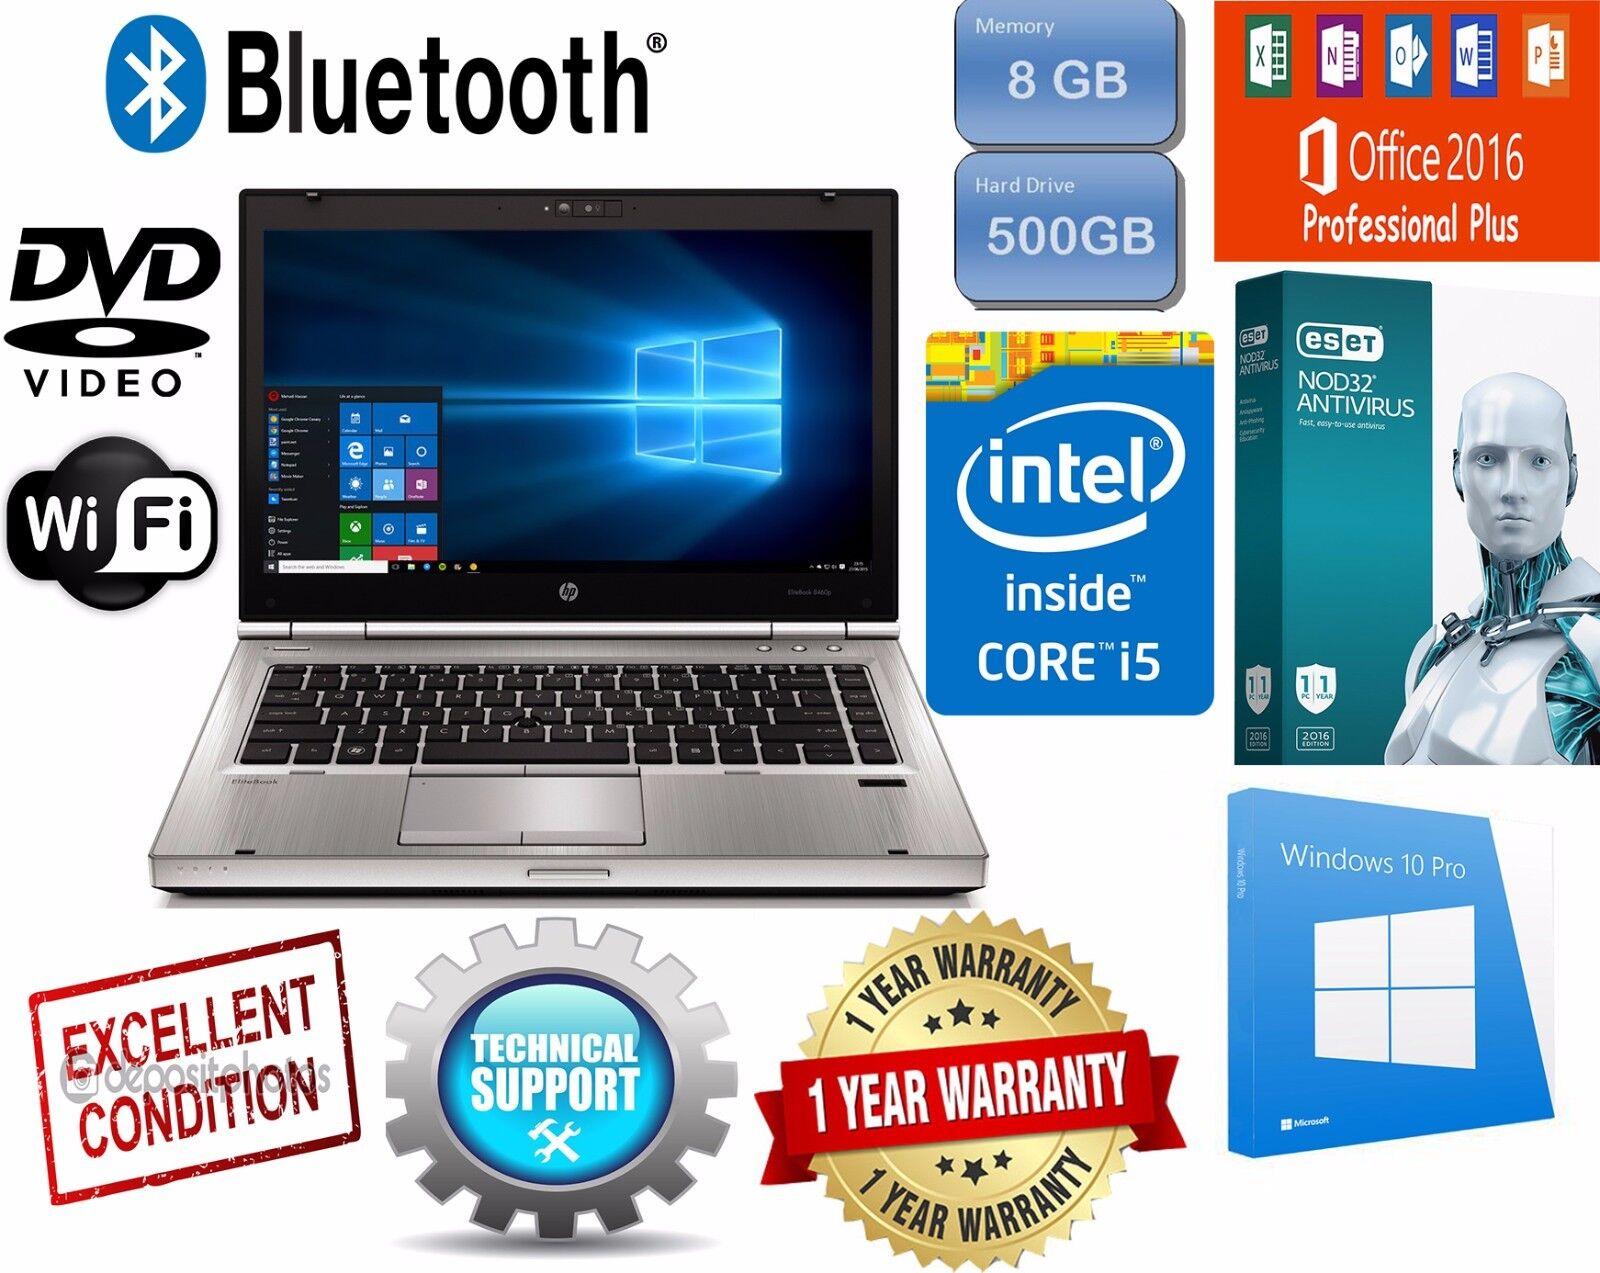 hp elitebook laptop computer p... Image 1